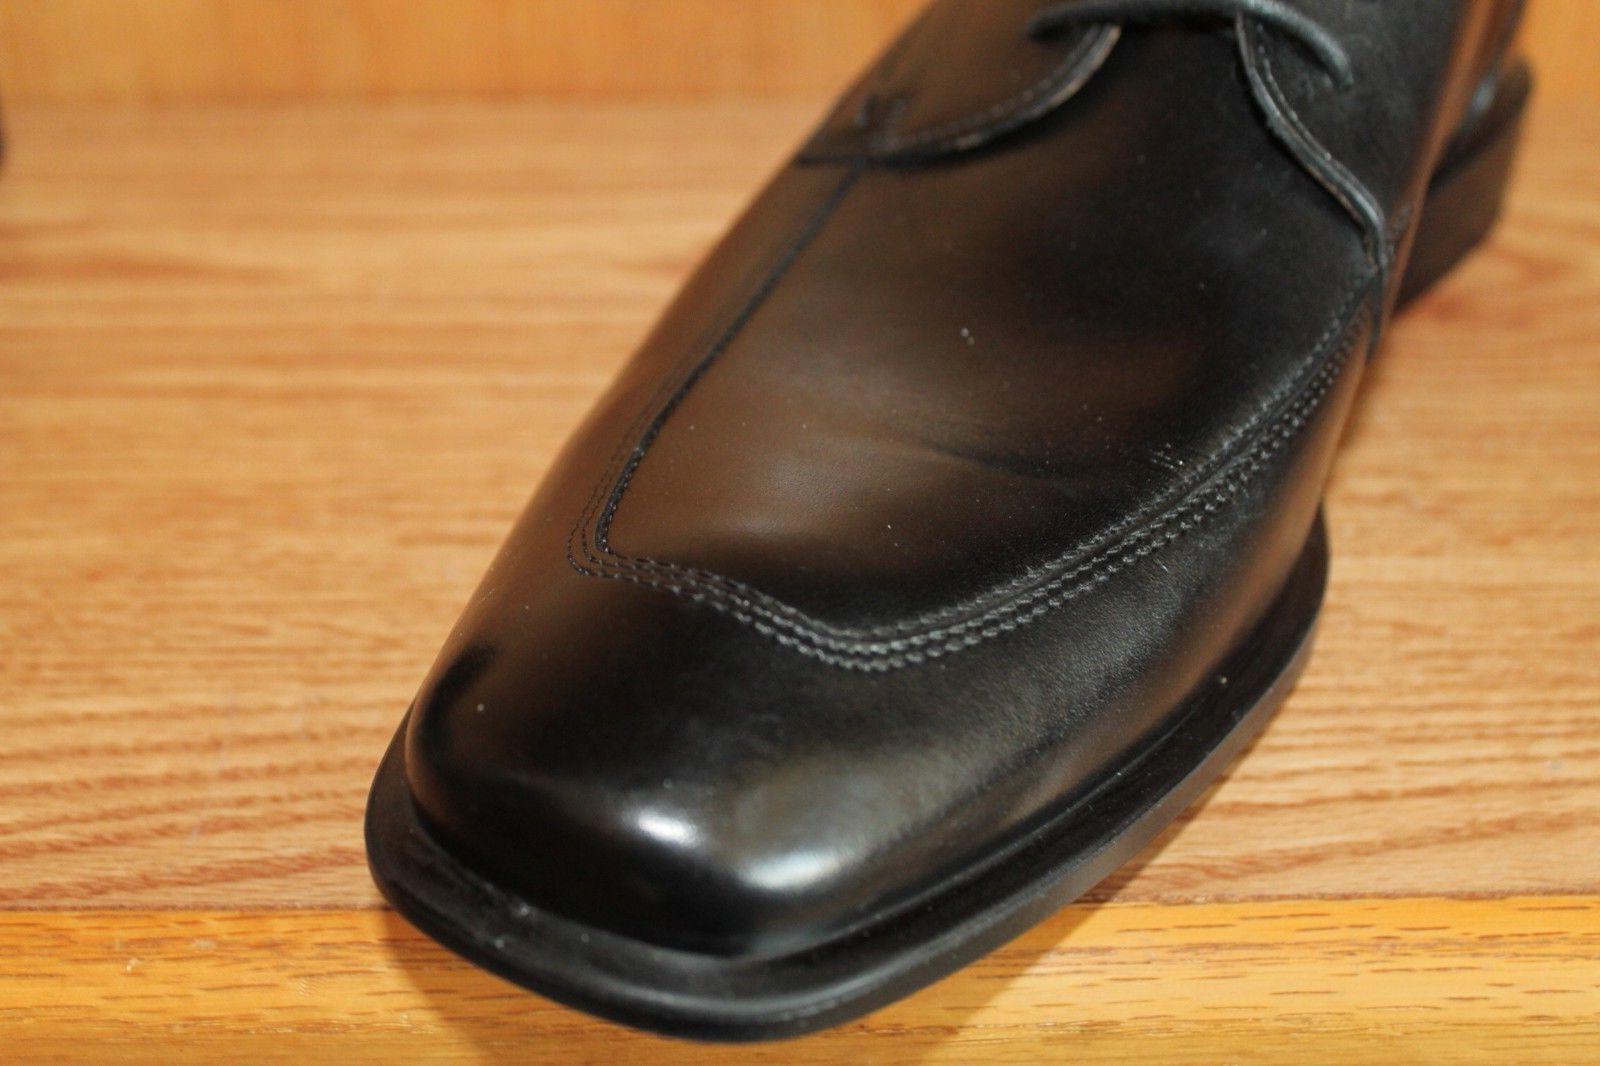 BRAND ECCO CAIRO APRON TOE BLACK DRESS Shoes Size Med